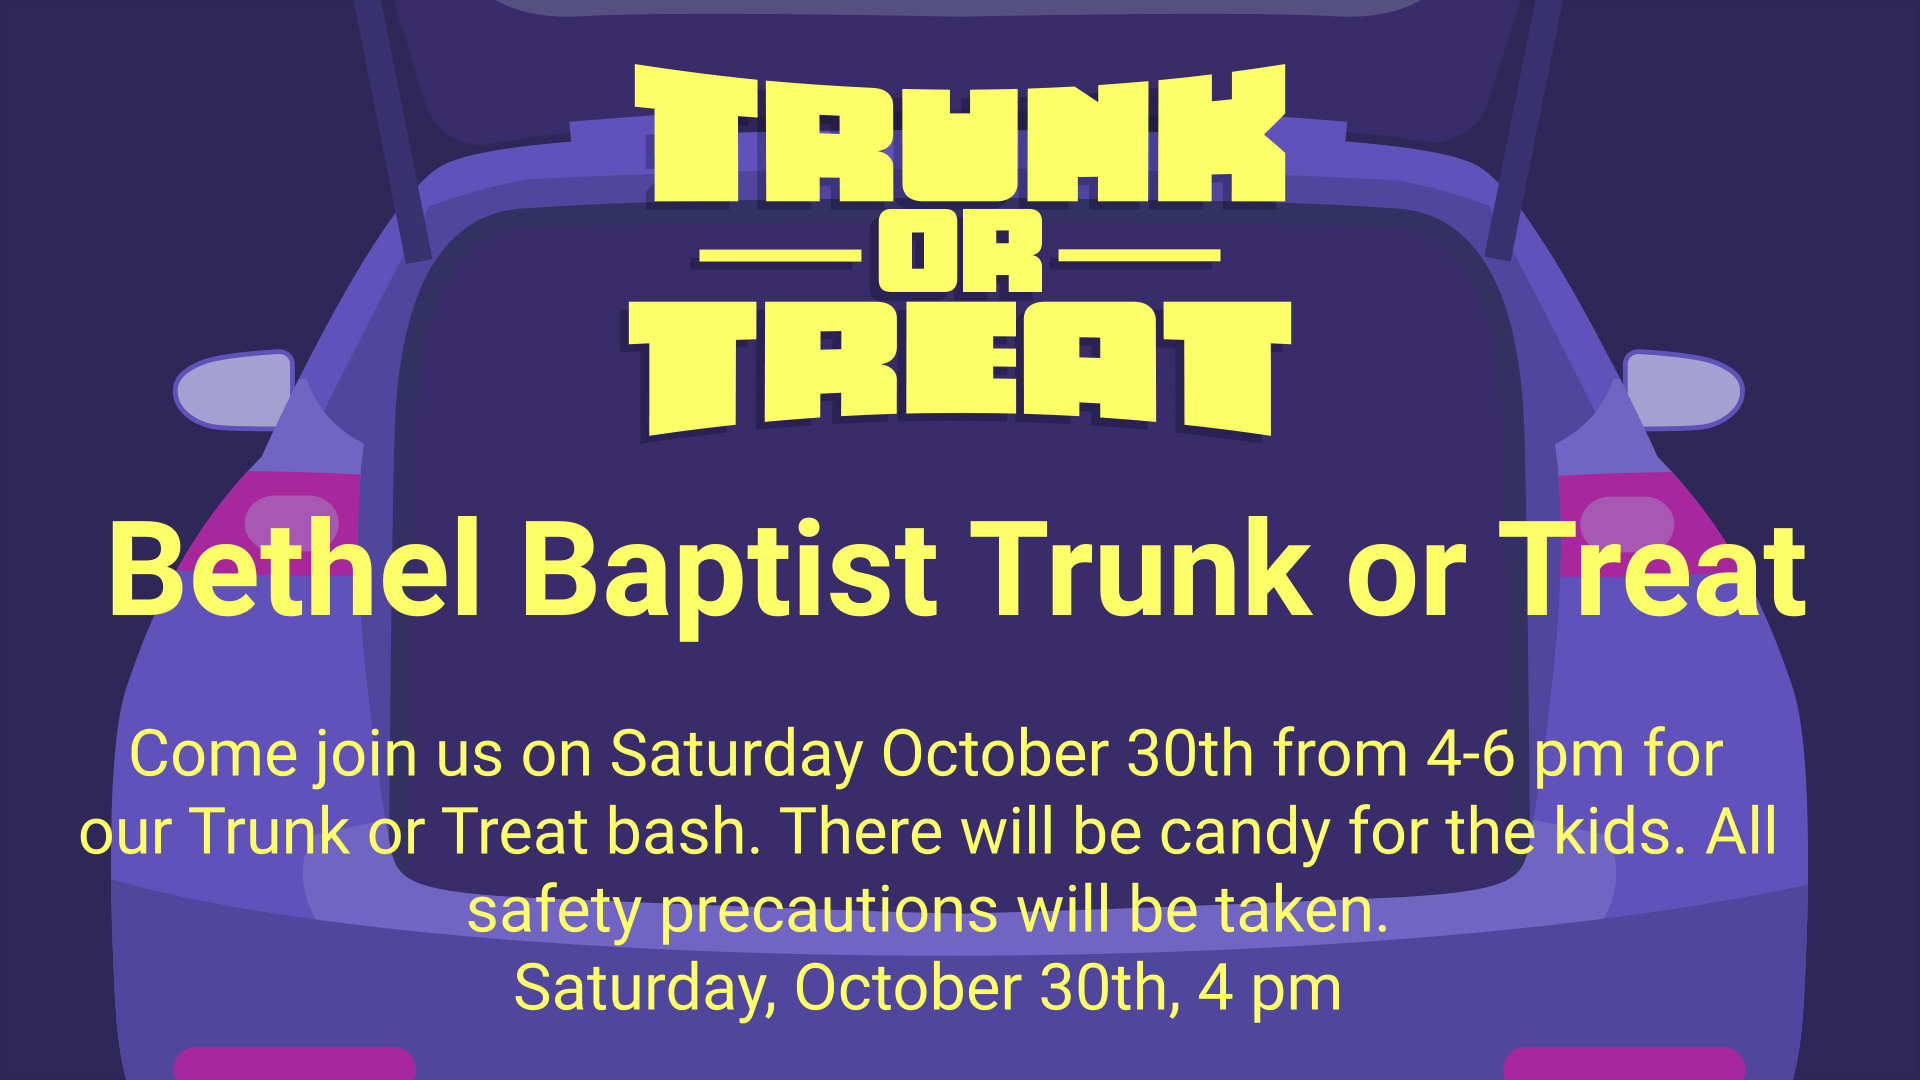 Bethel Baptist Trunk or Treat